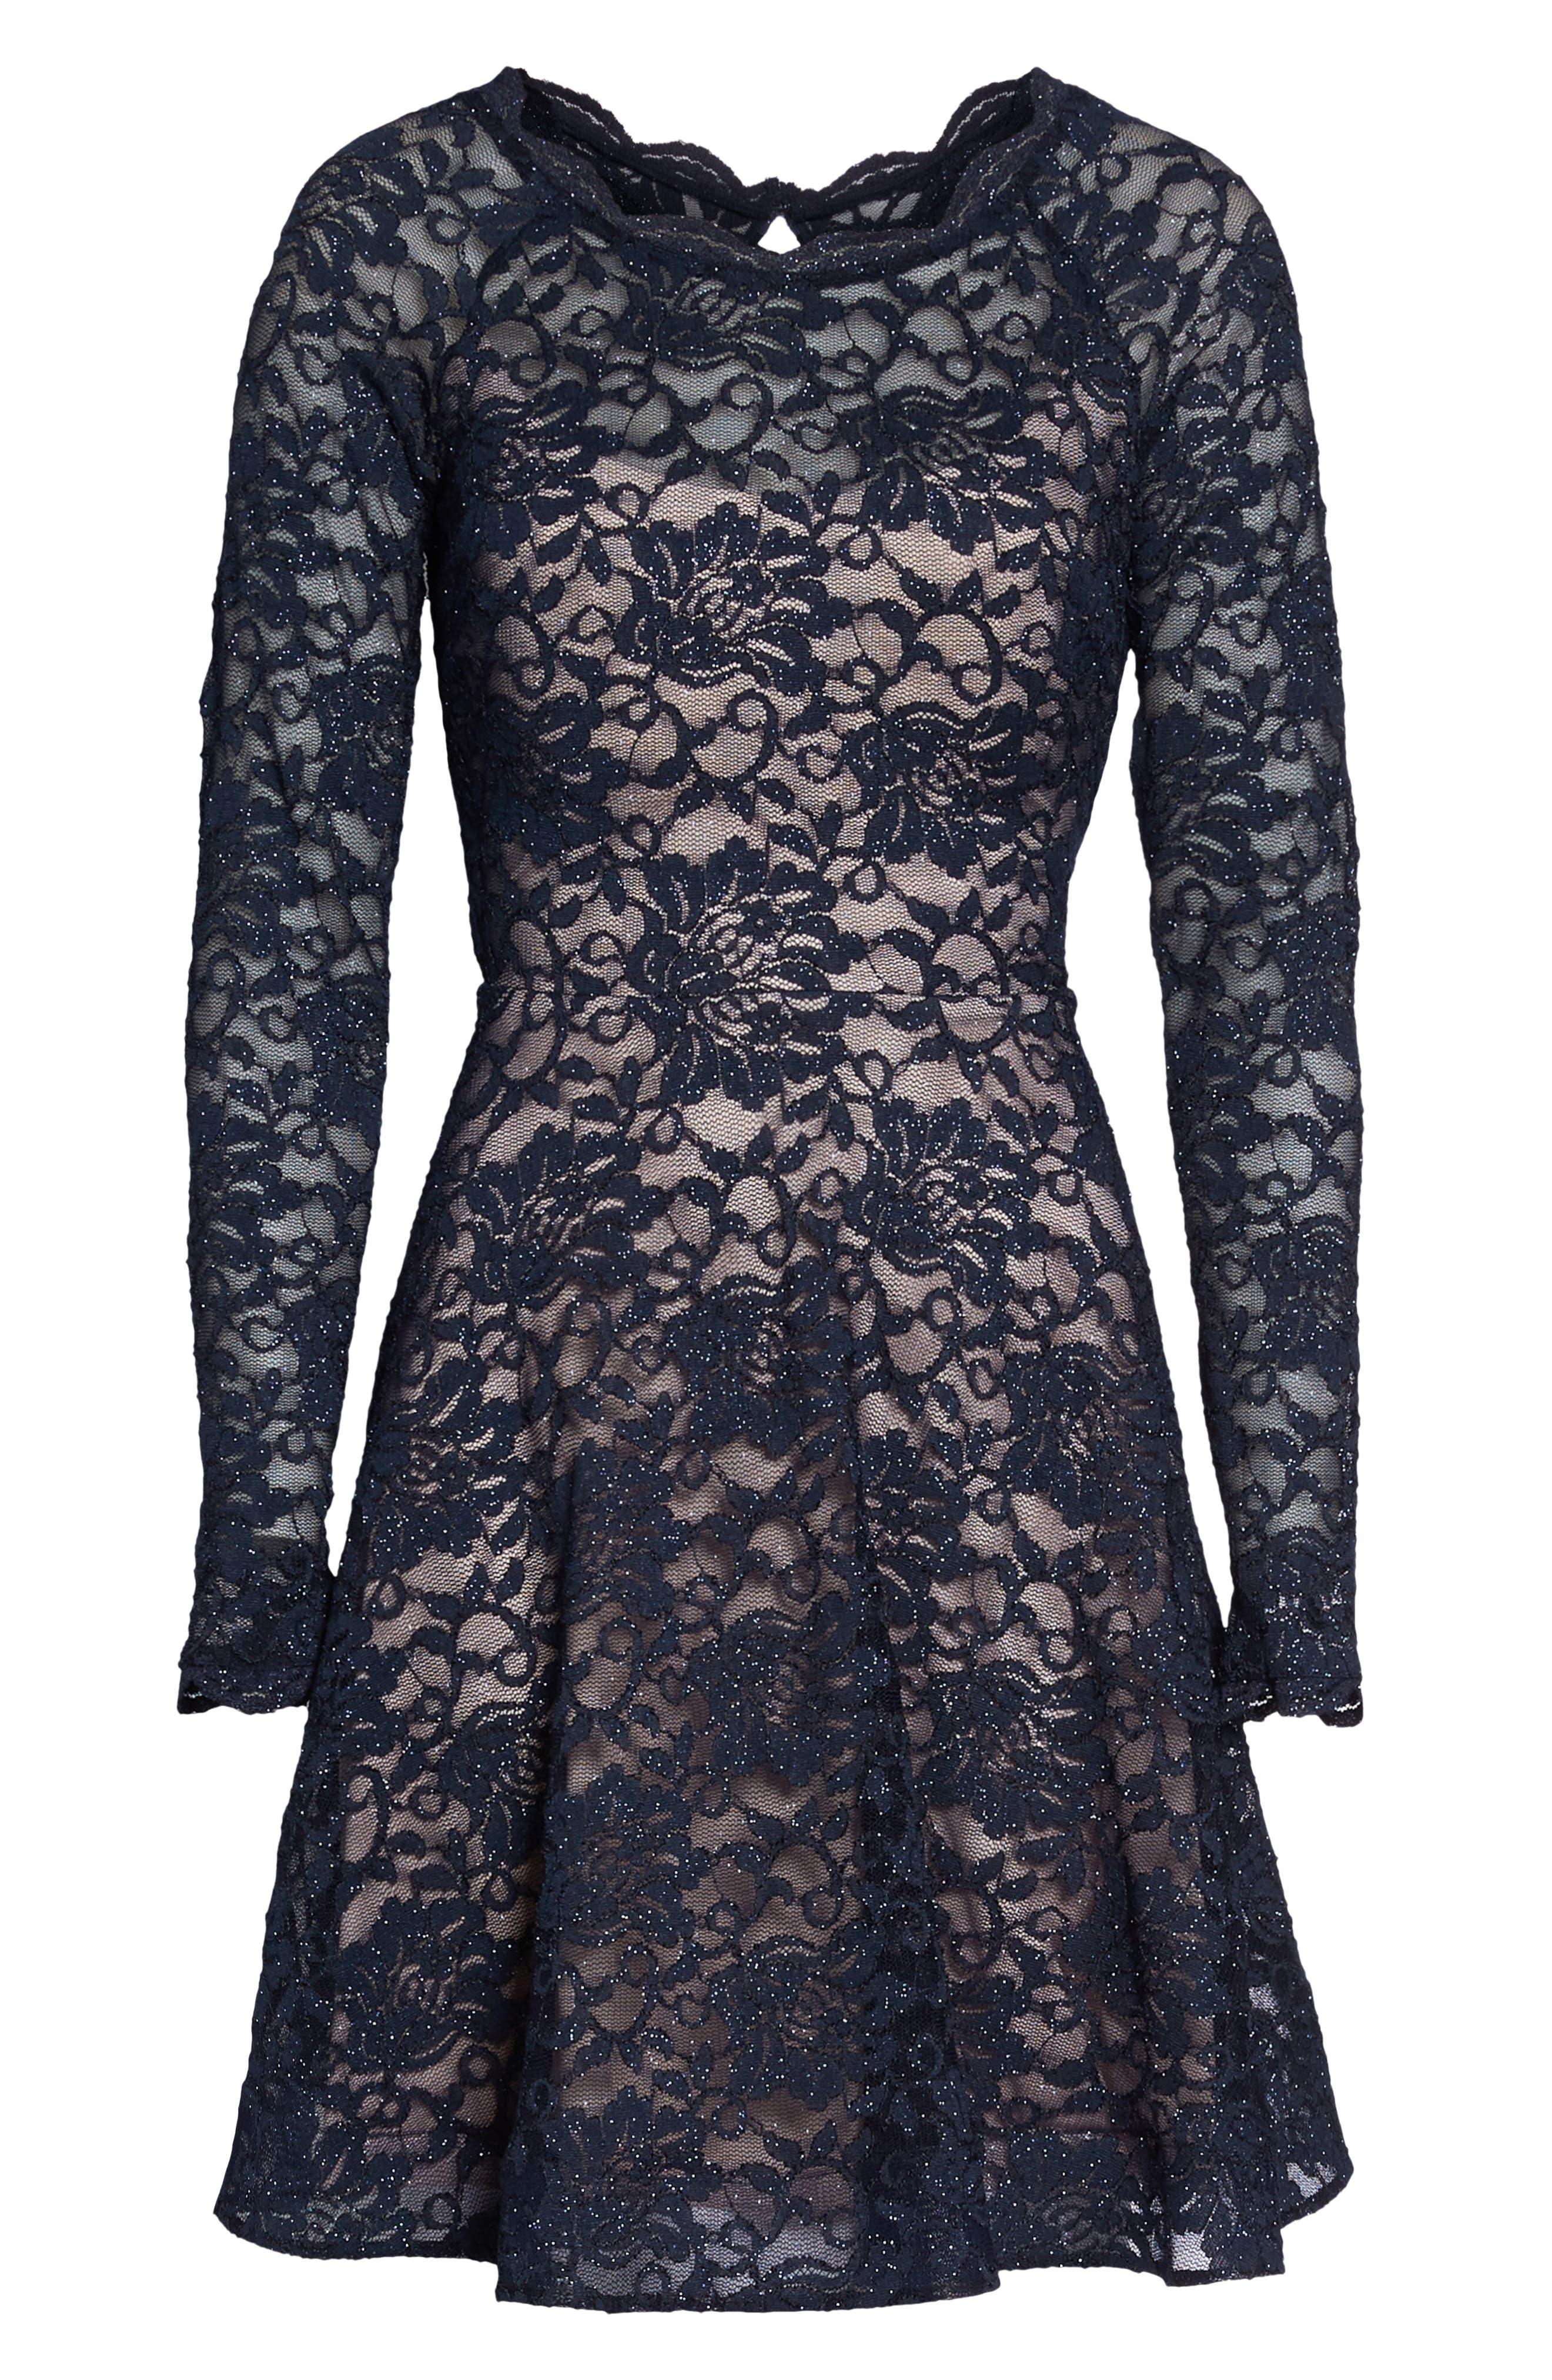 Glitter Lace Fit & Flare Dress,                             Alternate thumbnail 6, color,                             Navy/ Mauve